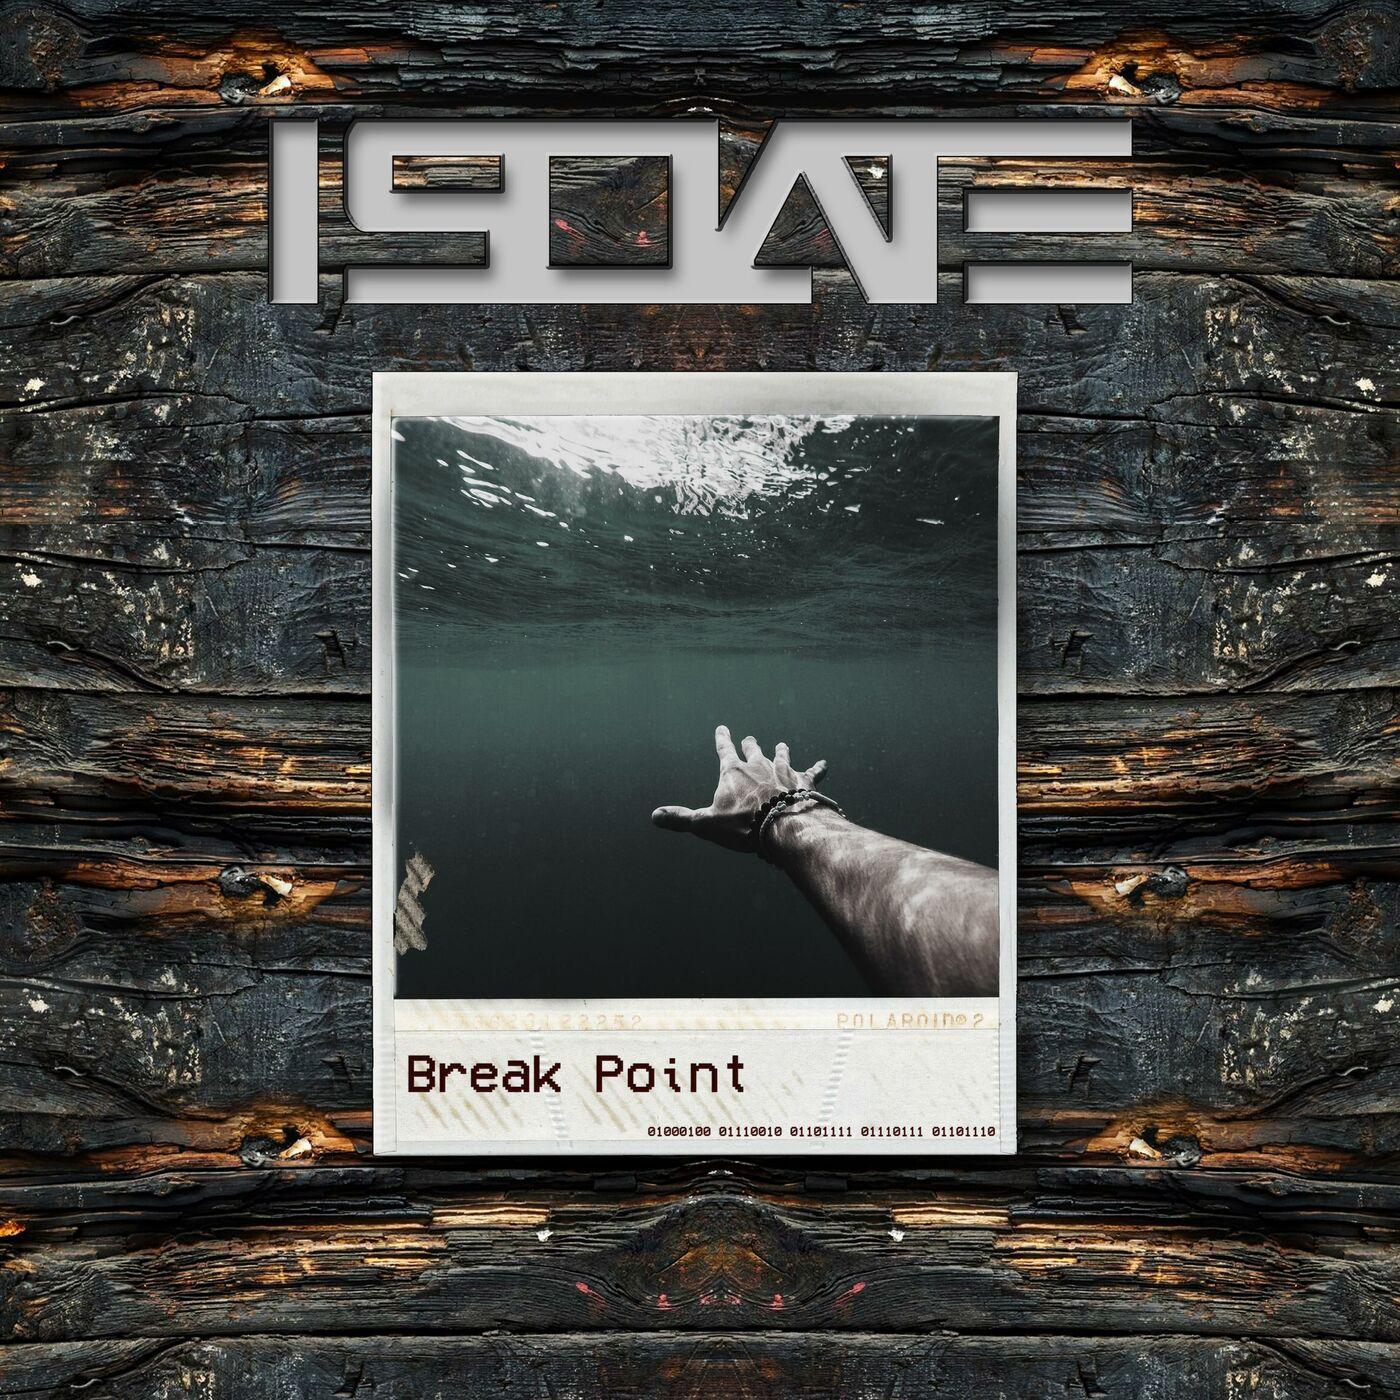 Isolate - Greyjoy [single] (2019)